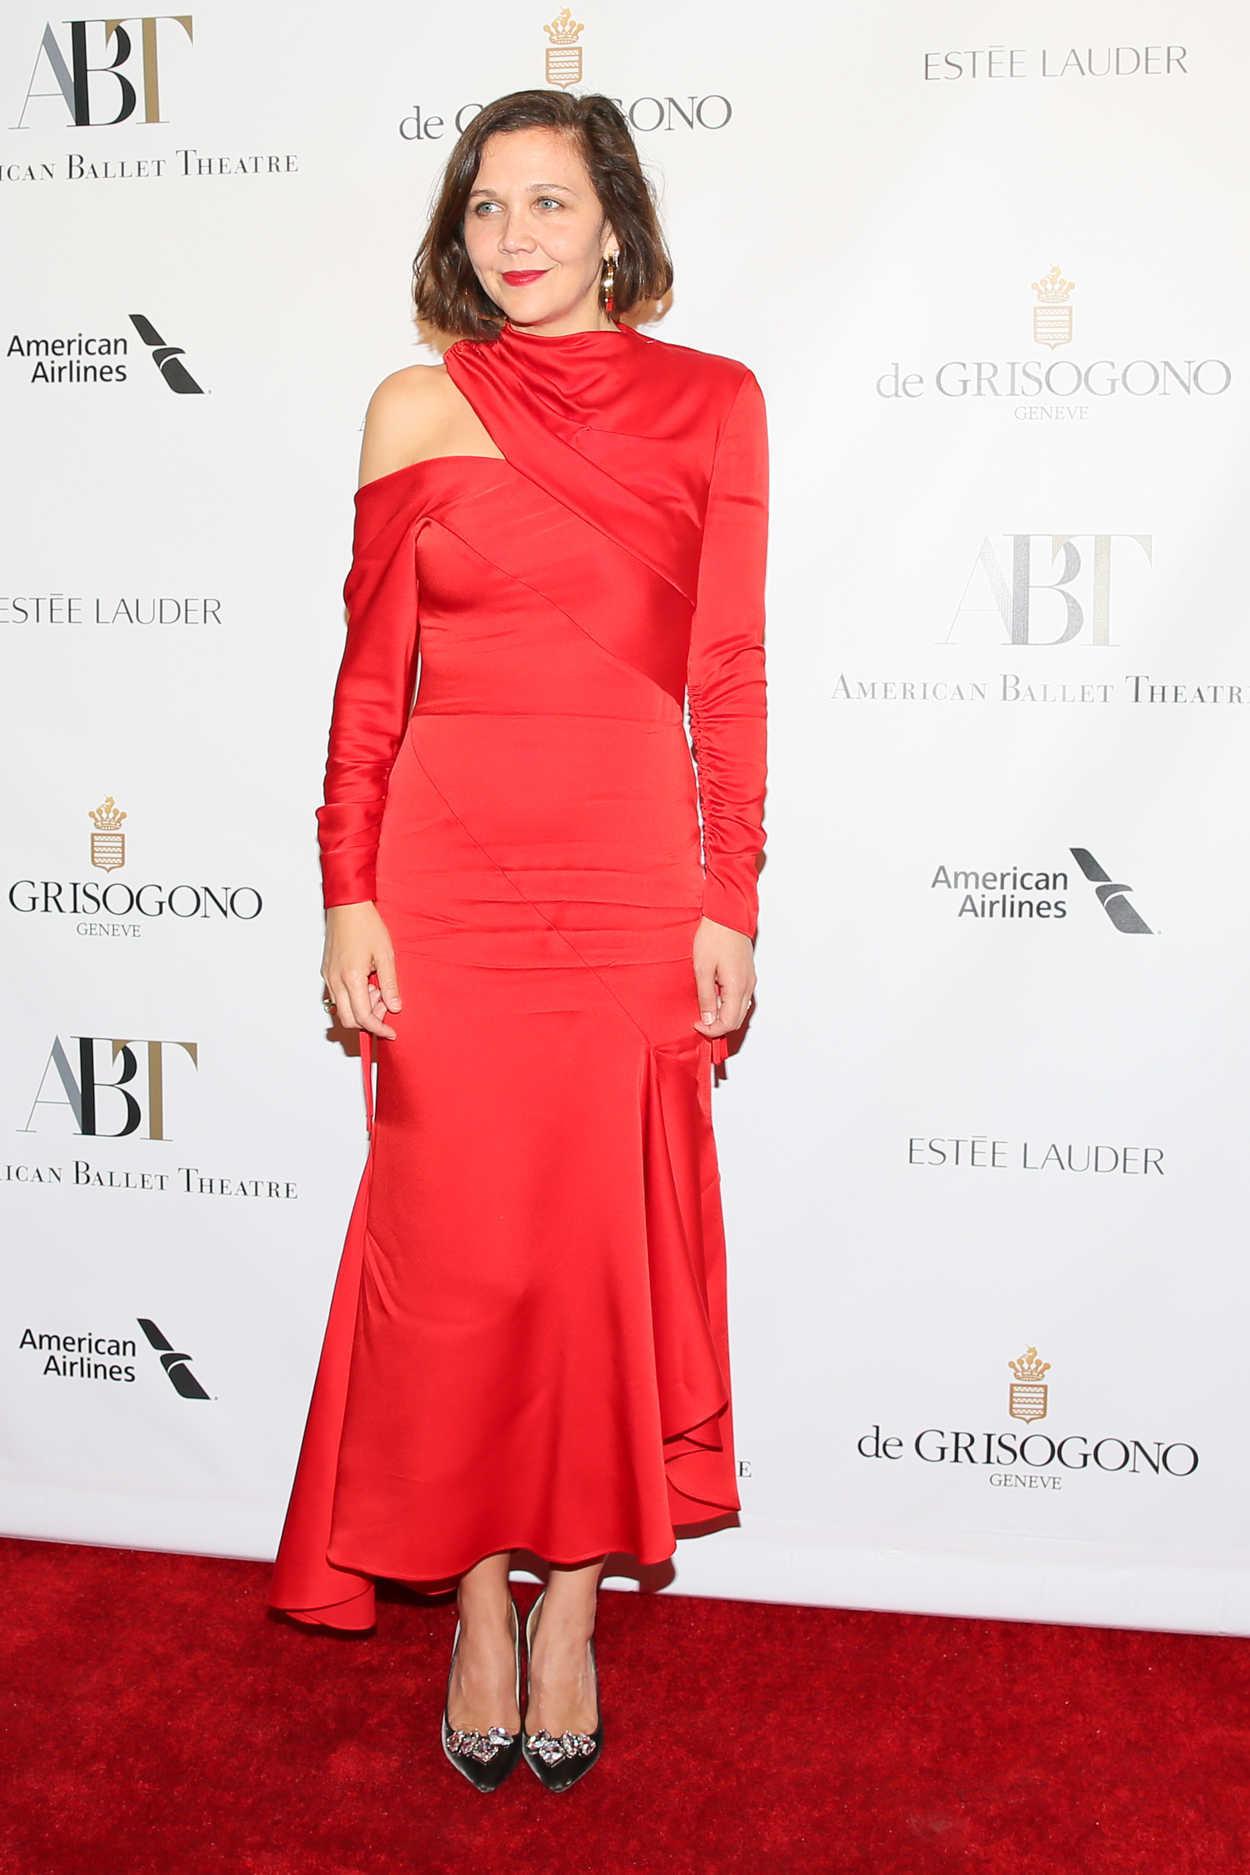 Maggie Gyllenhaal Attends 2017 American Ballet Theatre